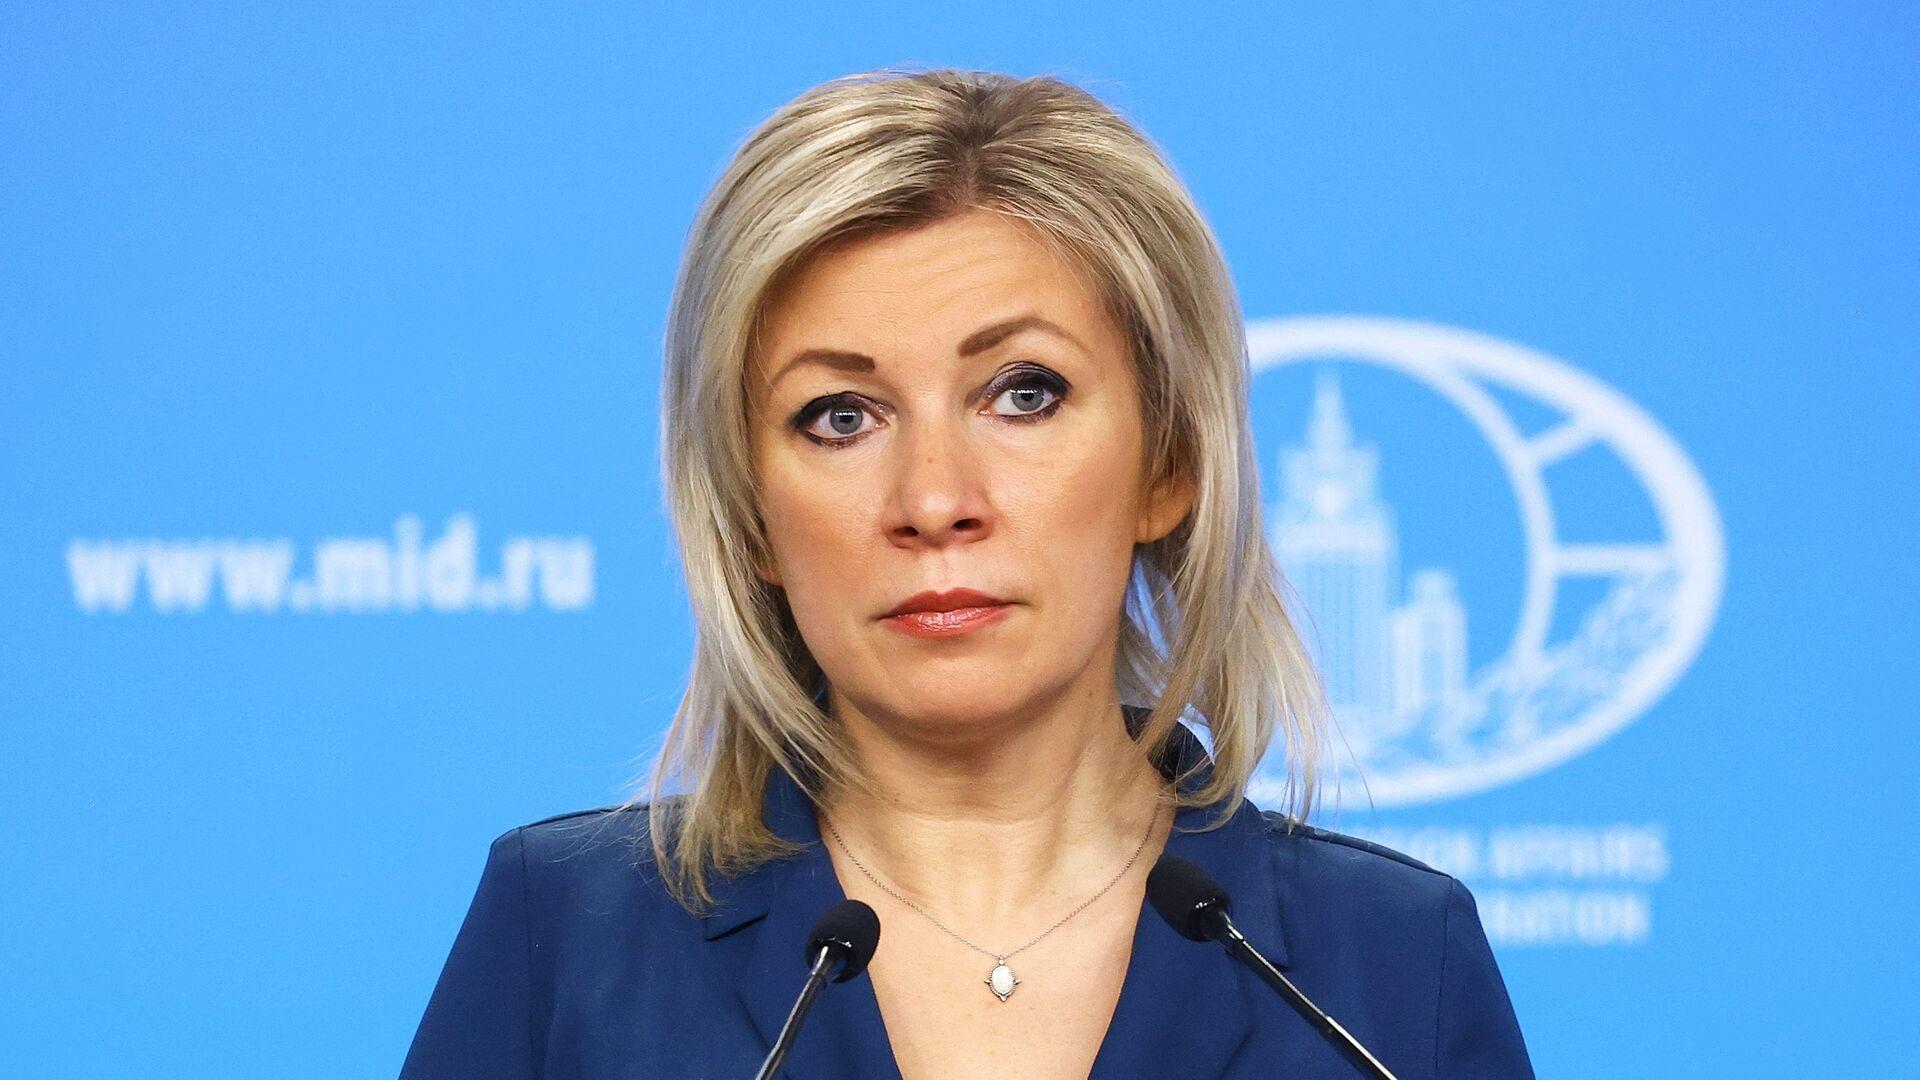 María Zajárova, portavoz del Ministerio de Exteriores de Rusia - Sputnik Mundo, 1920, 10.06.2021